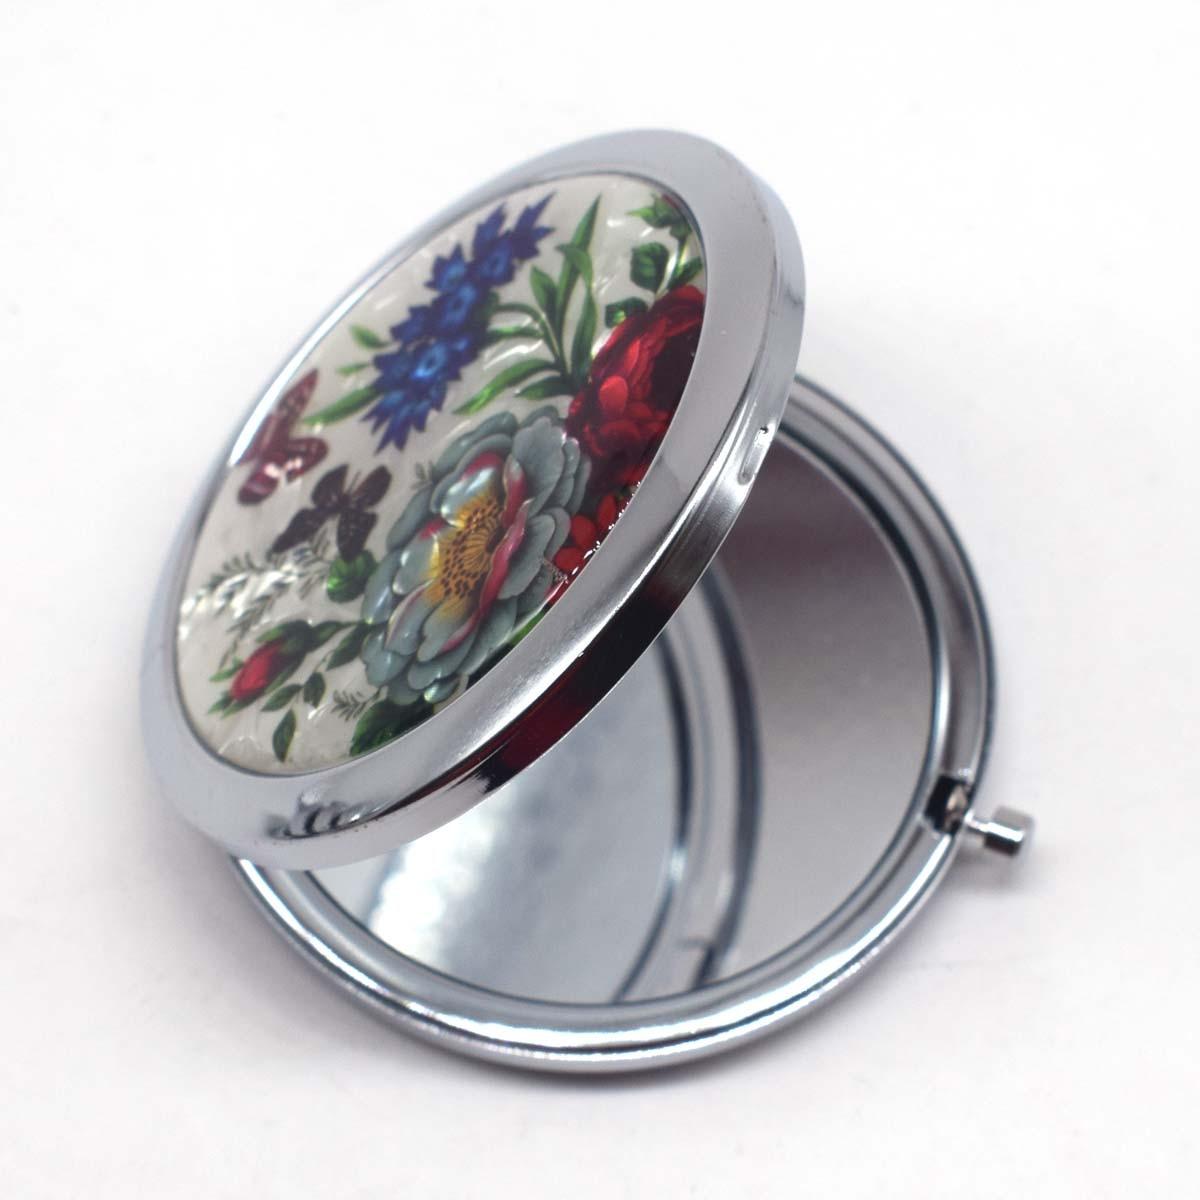 Spiegel Tasche Make-up Spiegel Kleine Kosmetische Kompakte Spiegel Espelho De Maquiagem Espejos De Bolsillo Dia 7 Cm Mini Gril